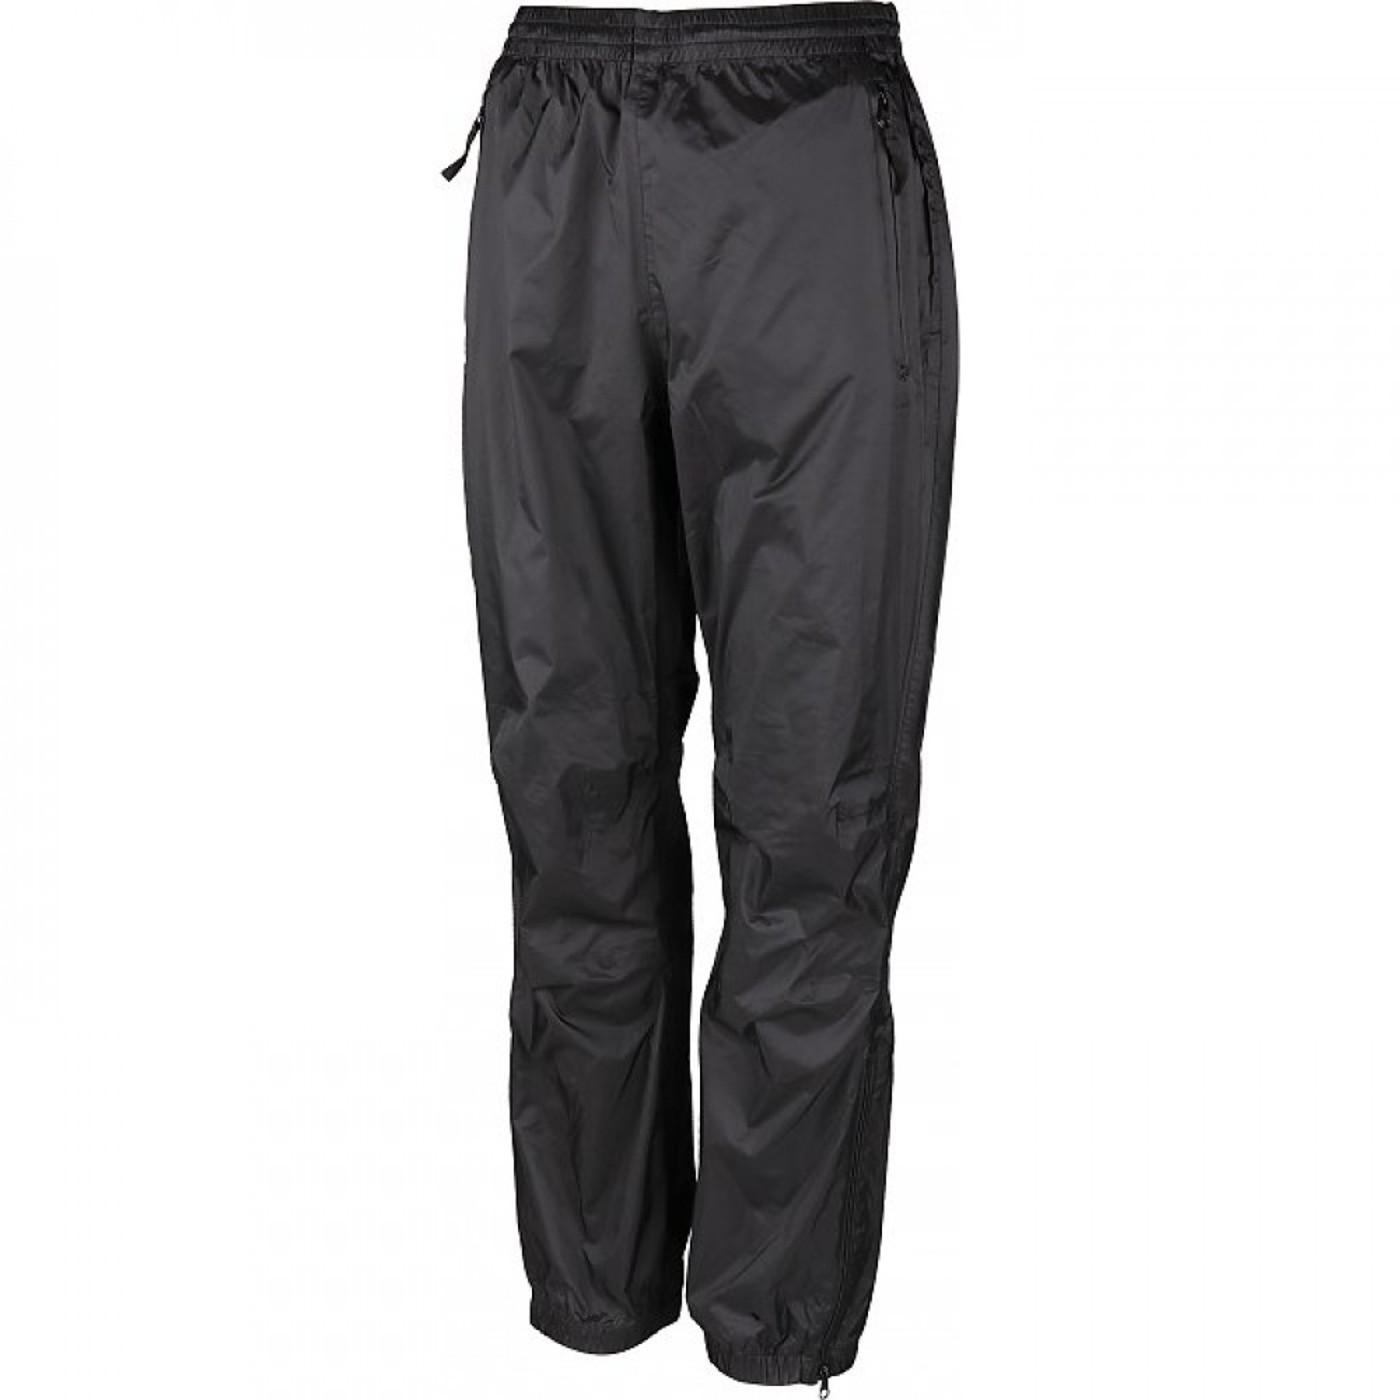 HIGH COLORADO Adults rain pants RAIN 1-A 1/4